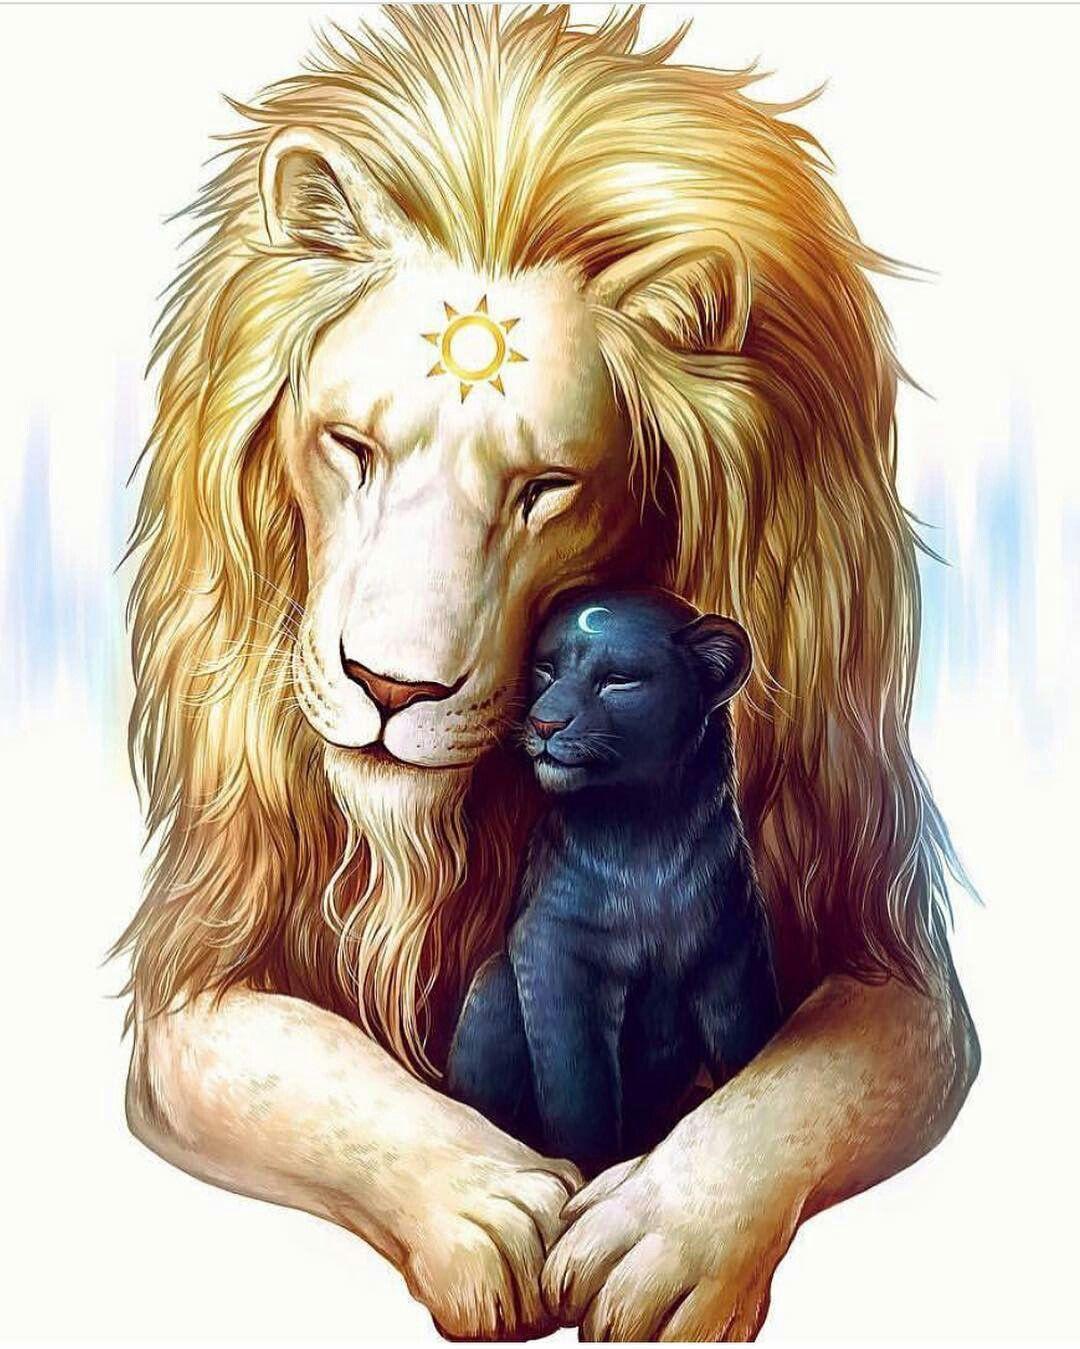 Солнце и луна | Лев живопись, Лев картинки, Картинки со львом